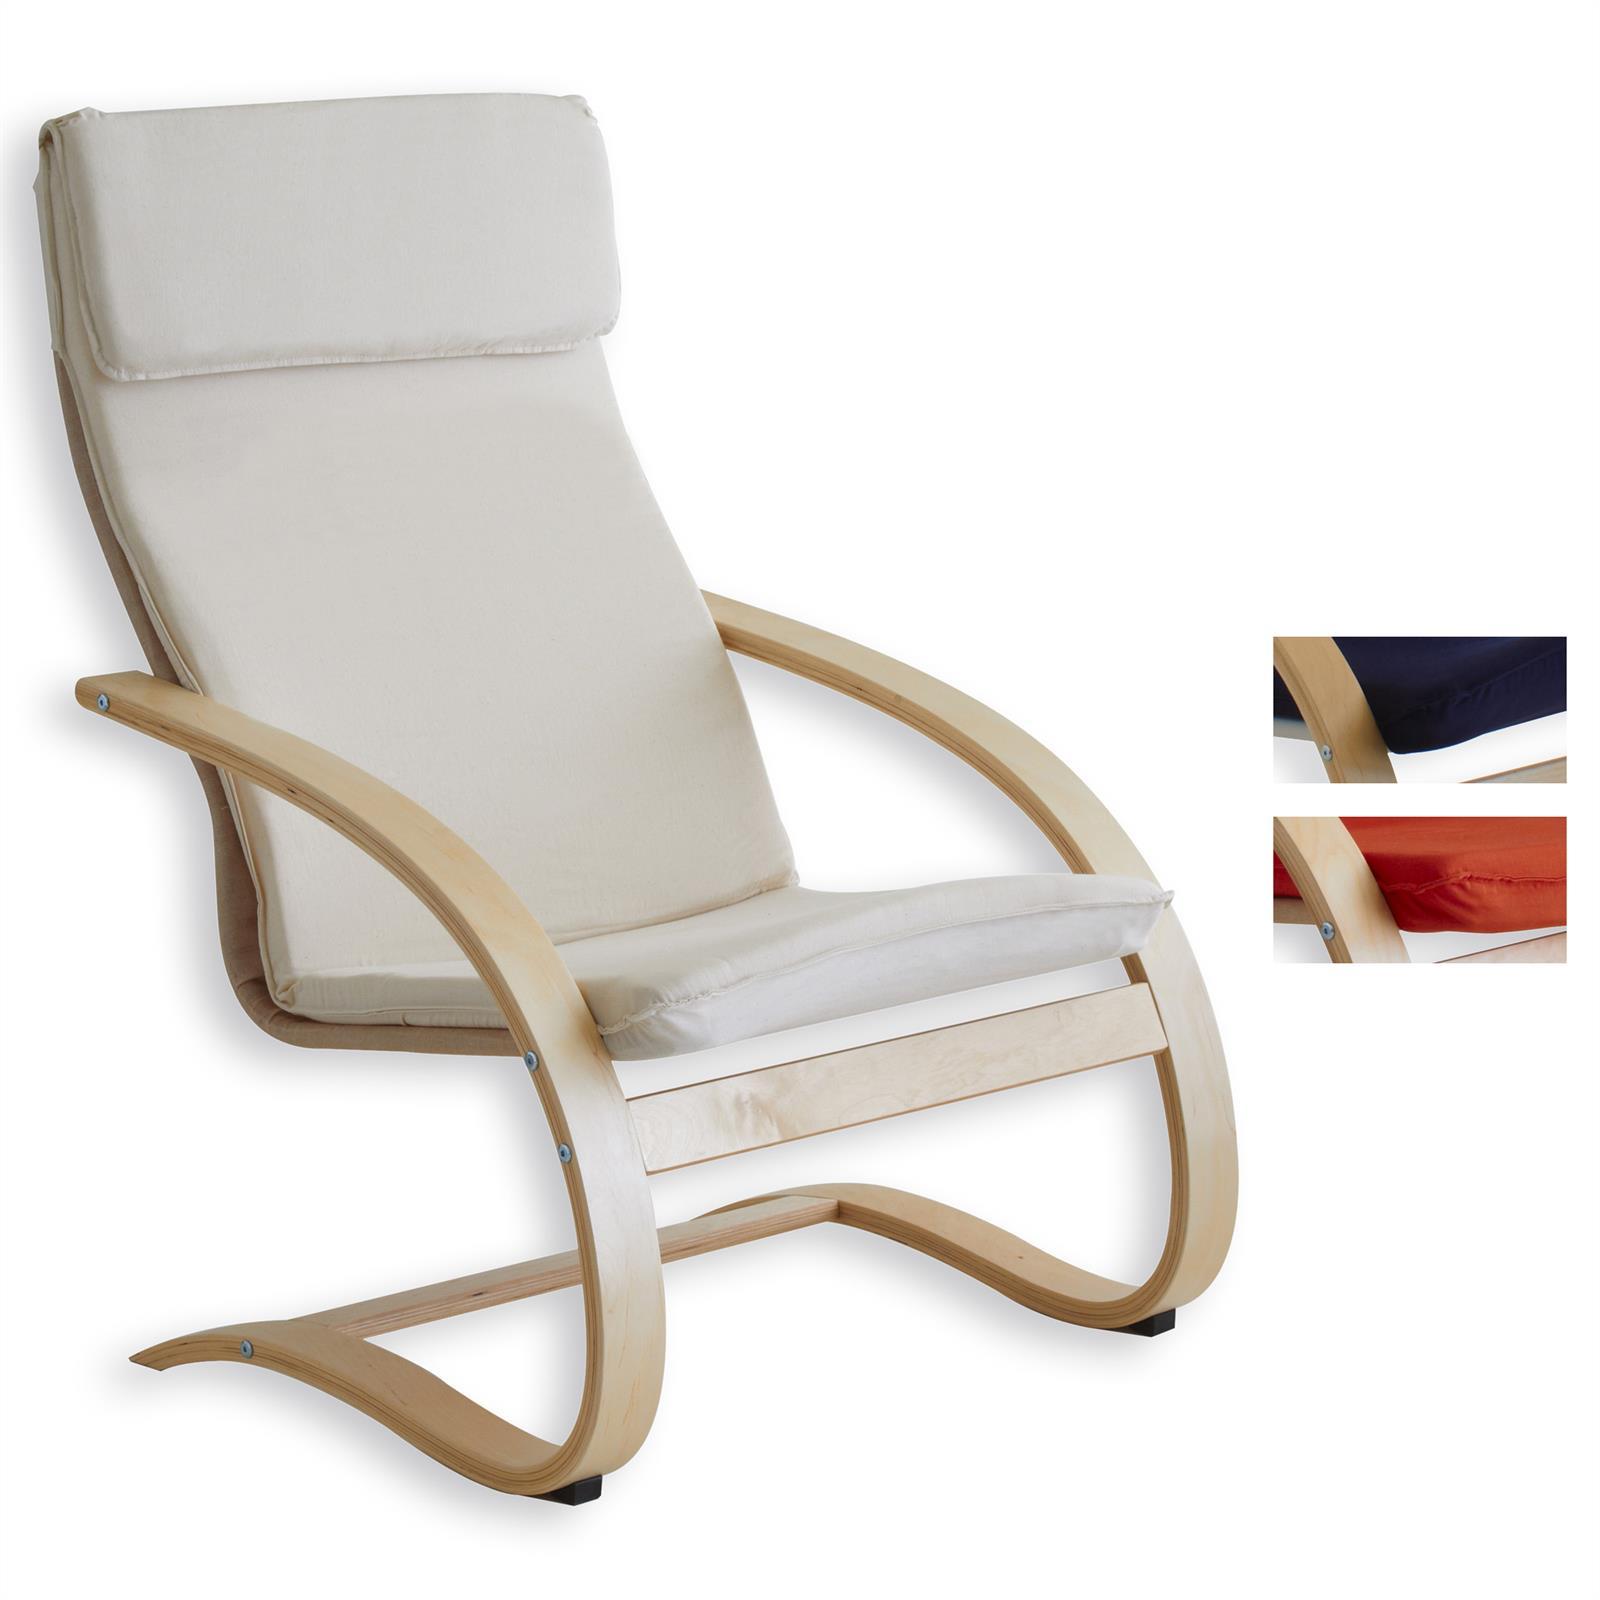 relaxsessel anna in verschiedenen farben mobilia24. Black Bedroom Furniture Sets. Home Design Ideas